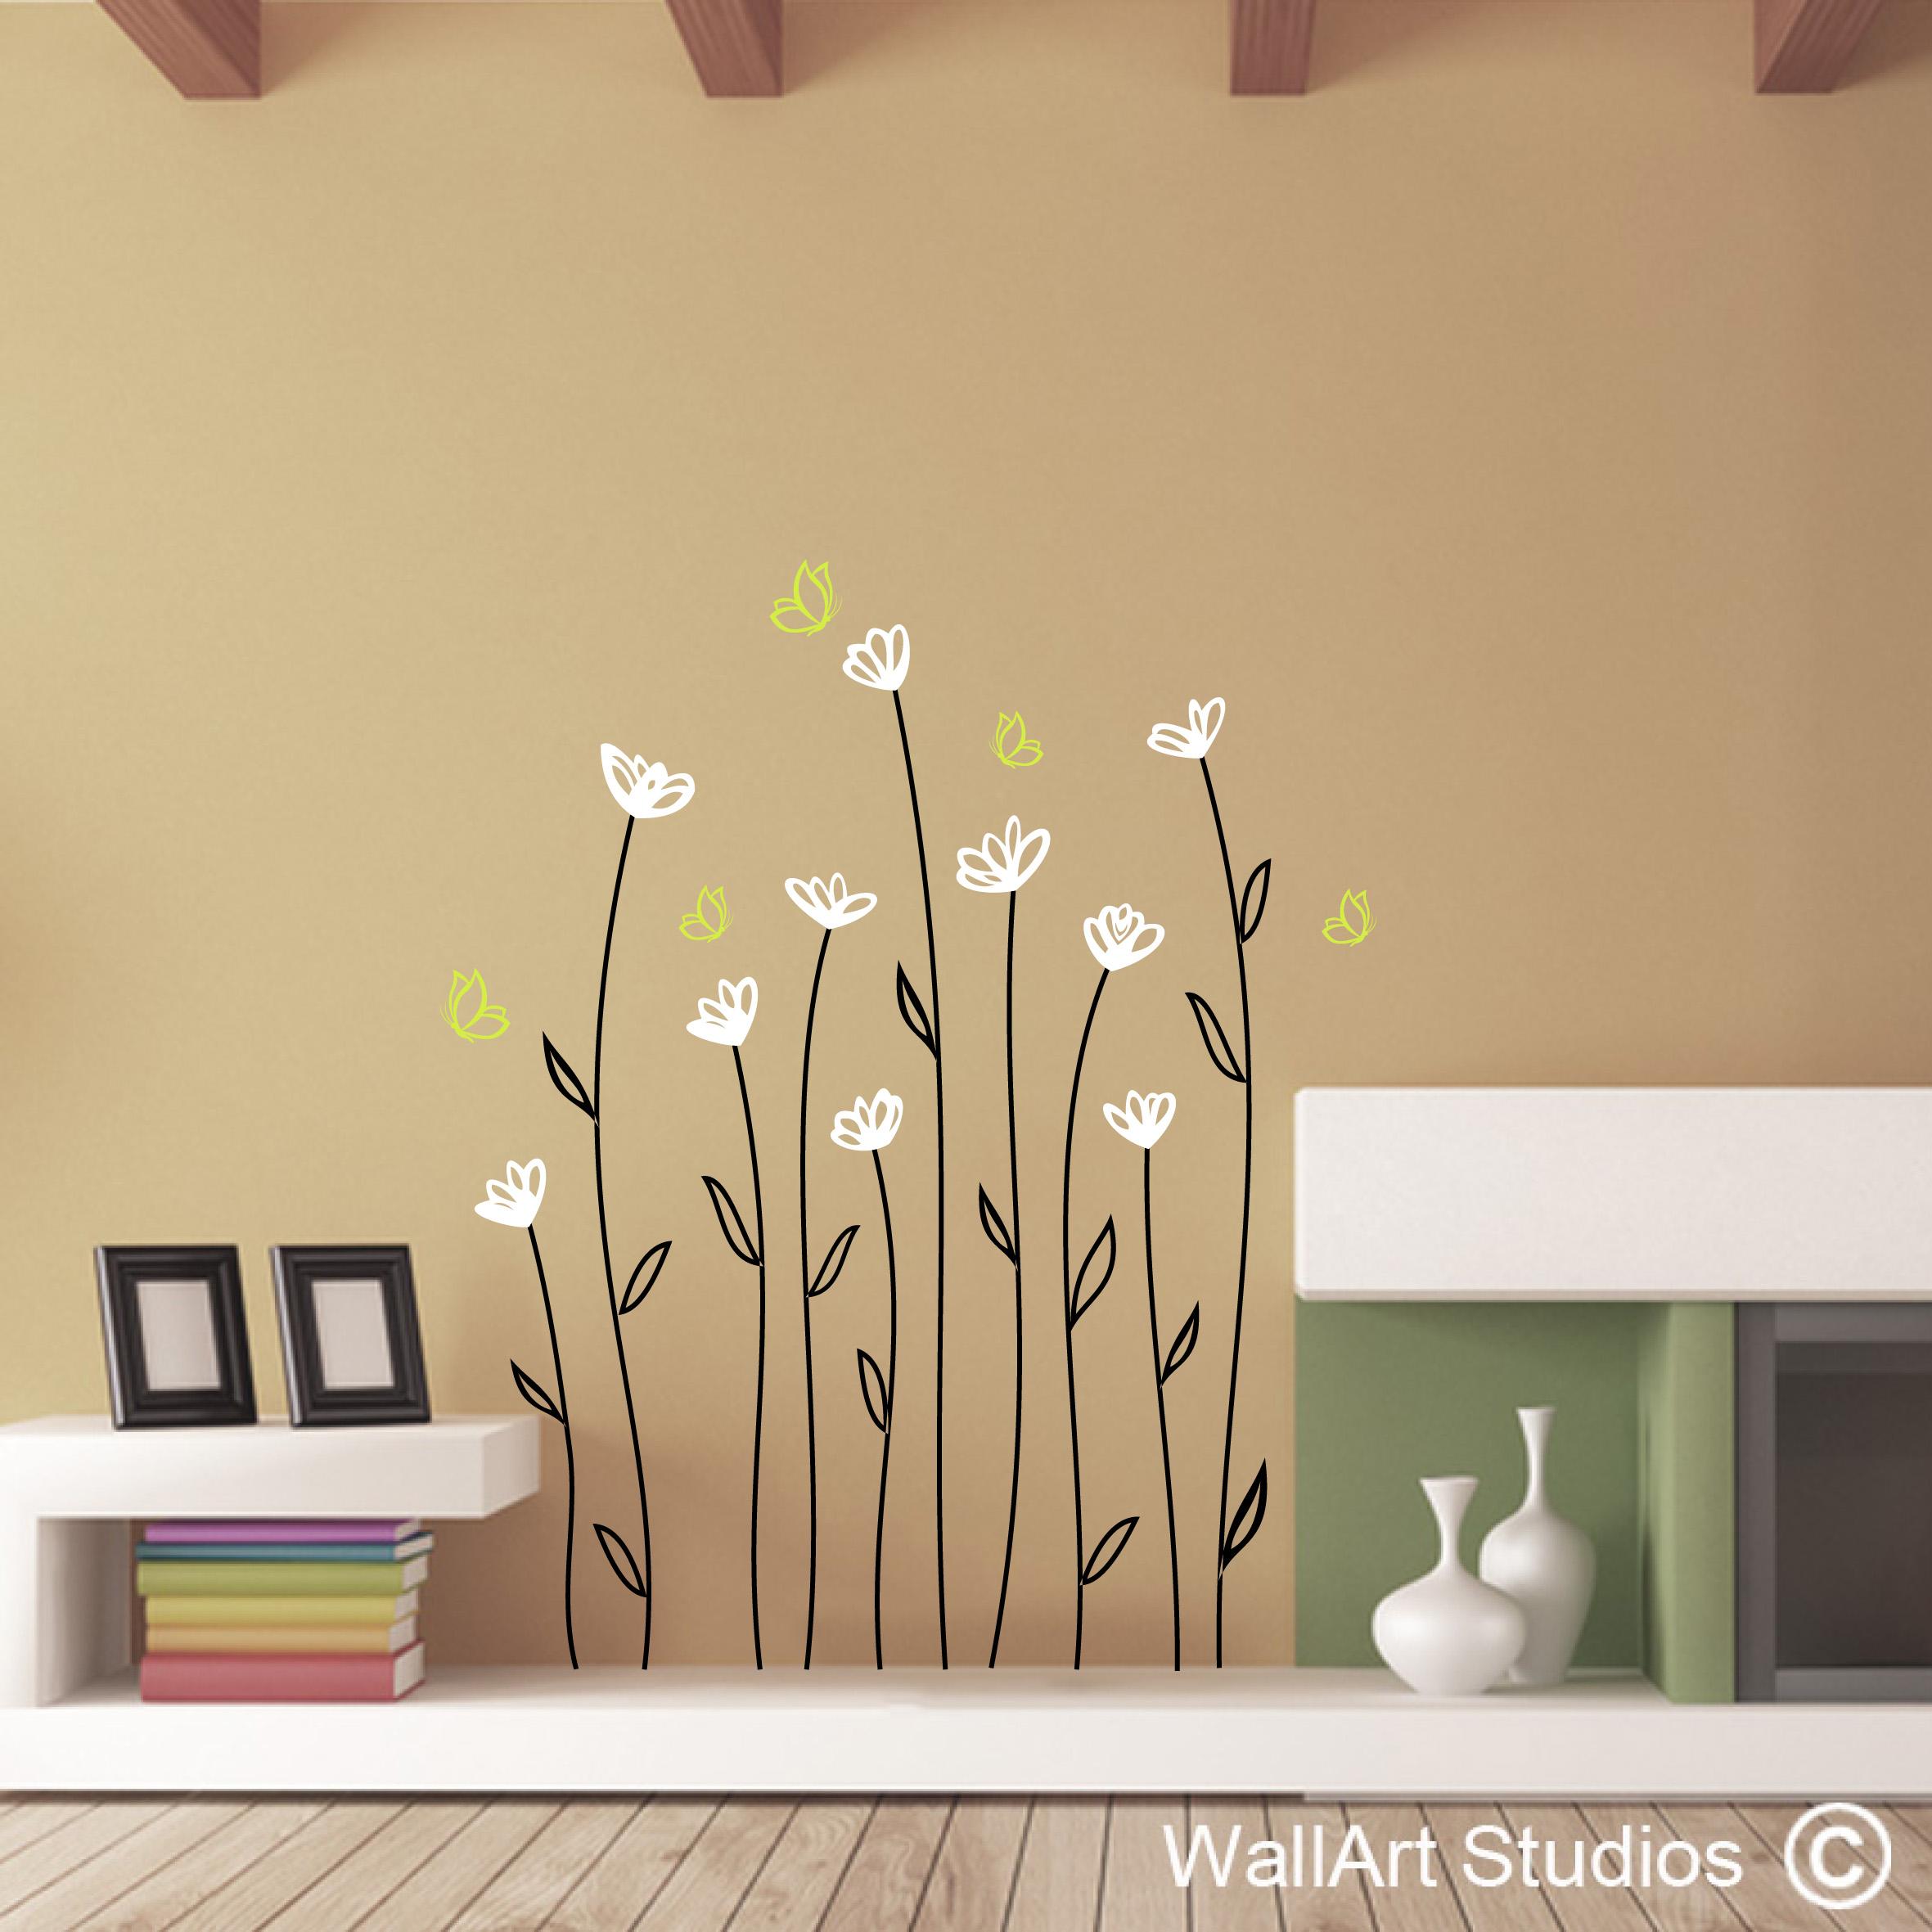 Flowers Plants Wall Art South Africa Wallart Studios